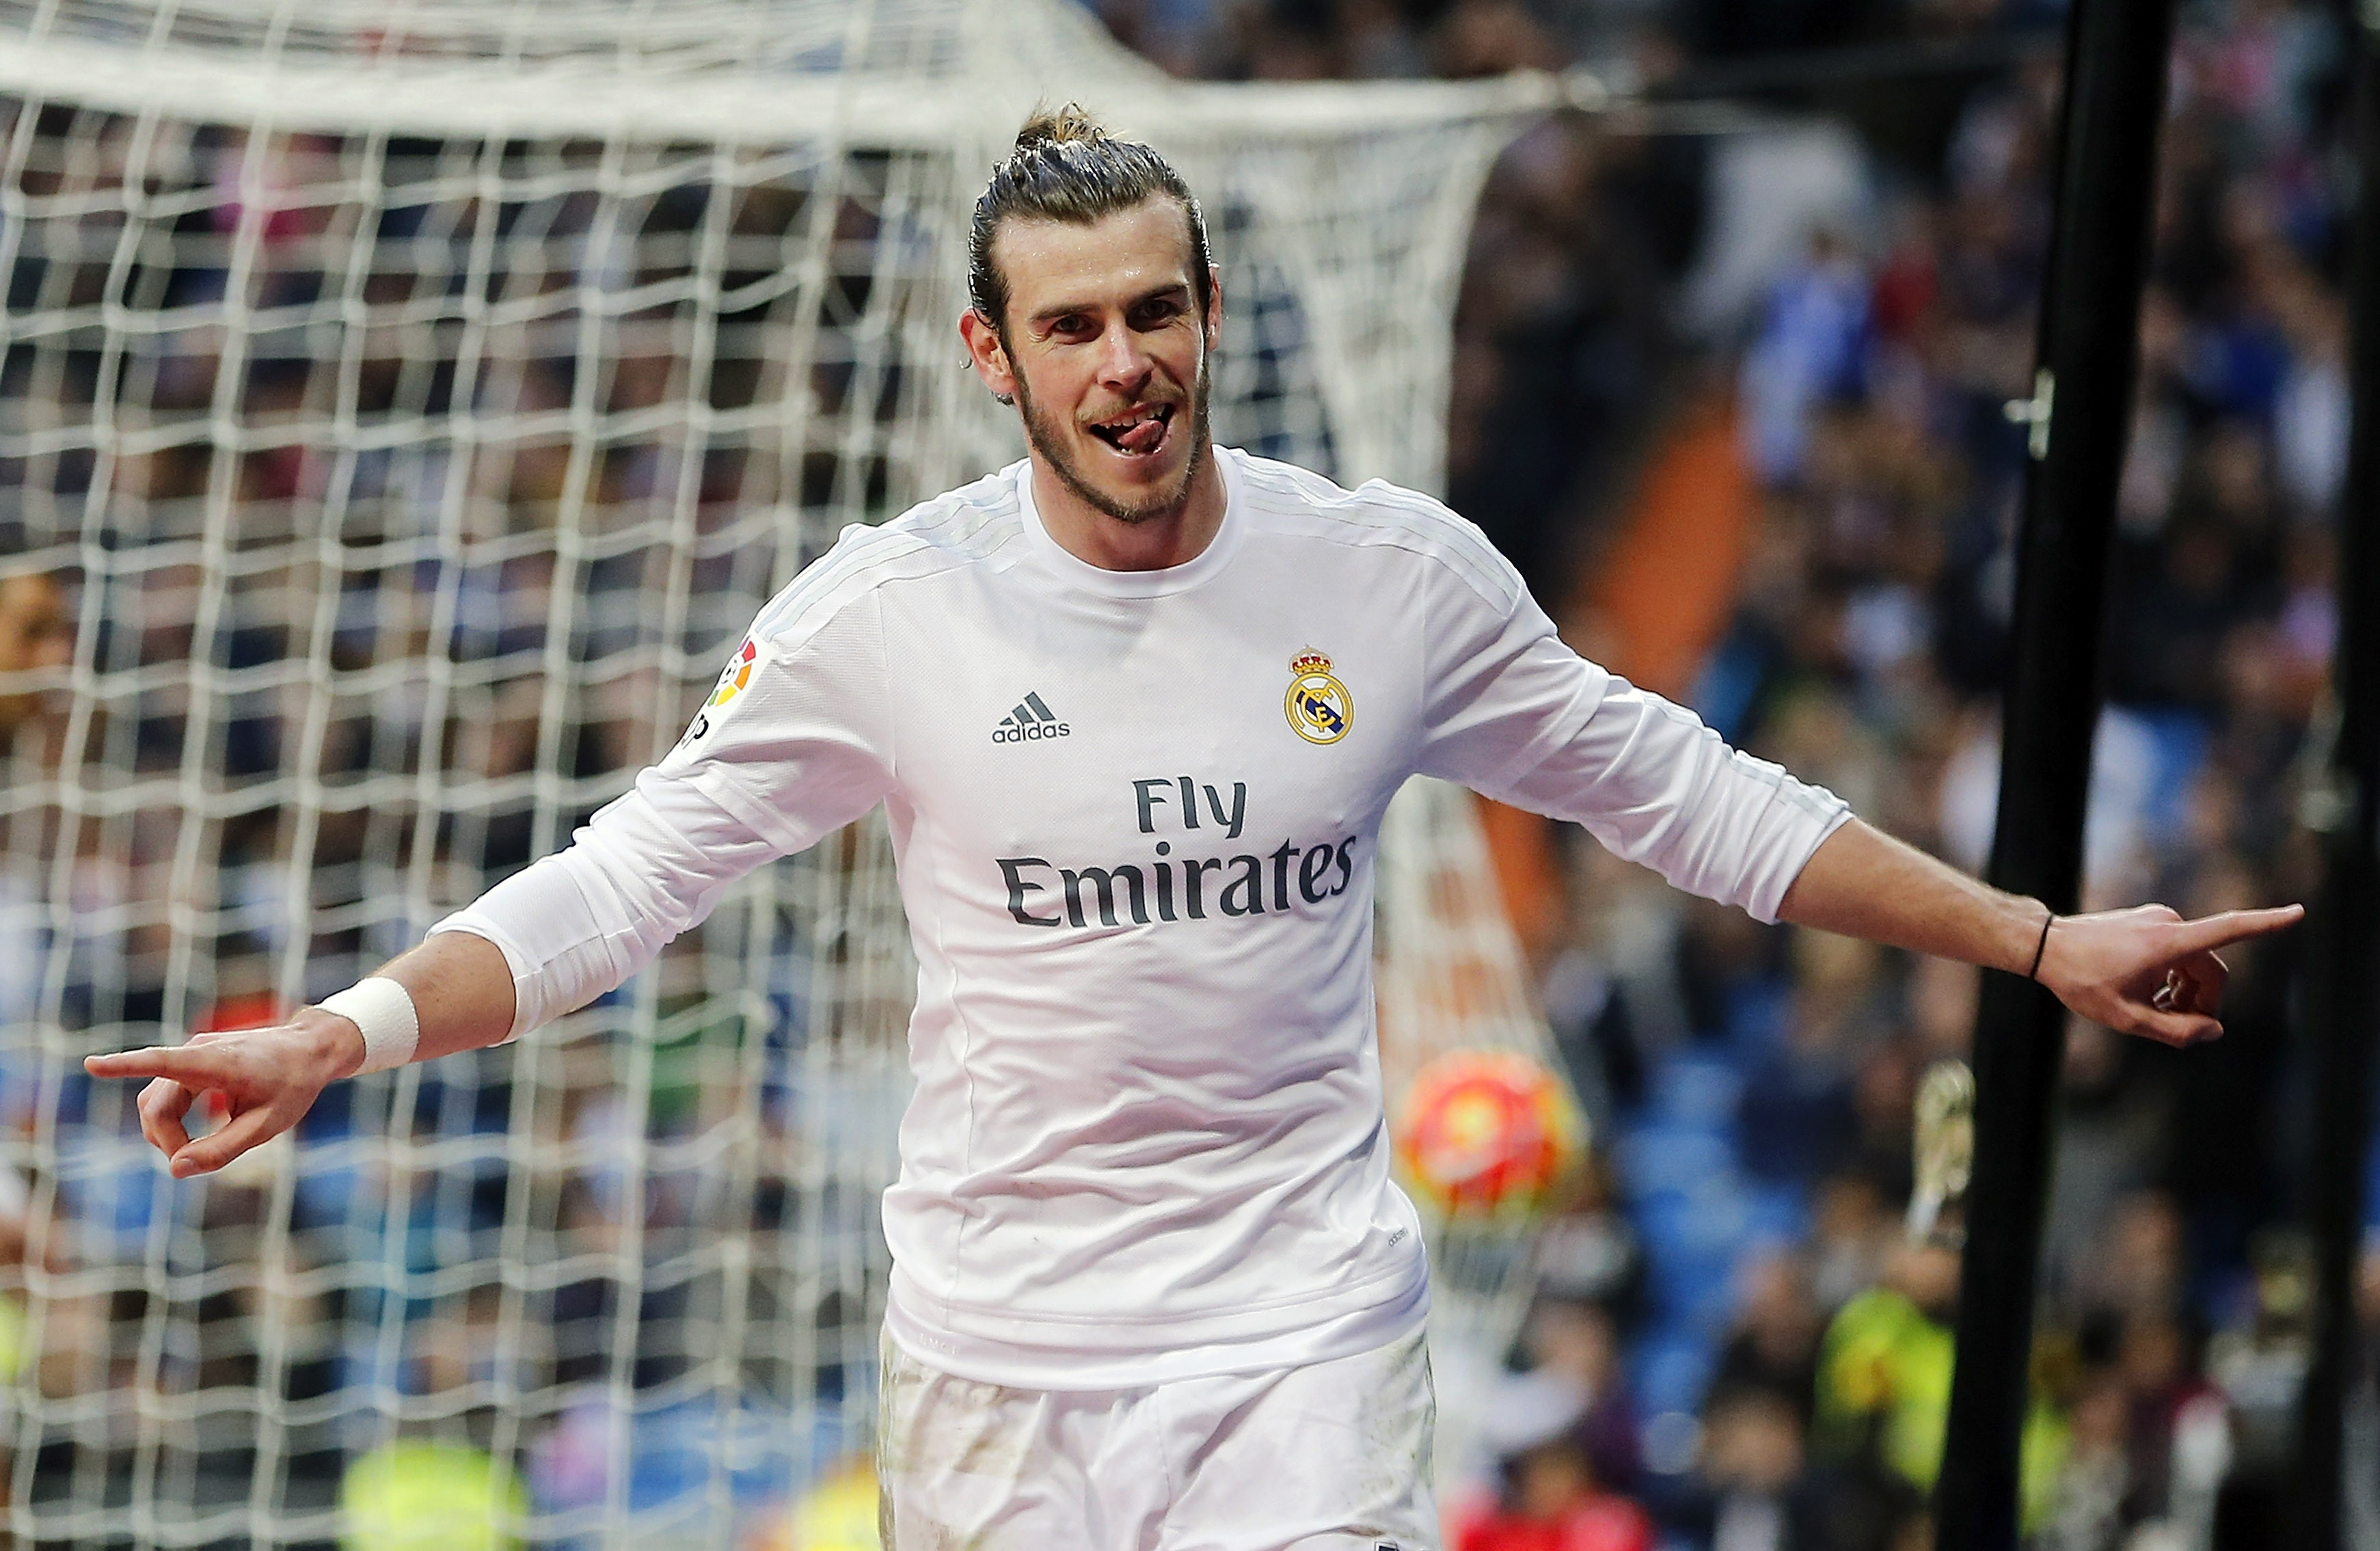 Gareth Bale Wallpapers Hd